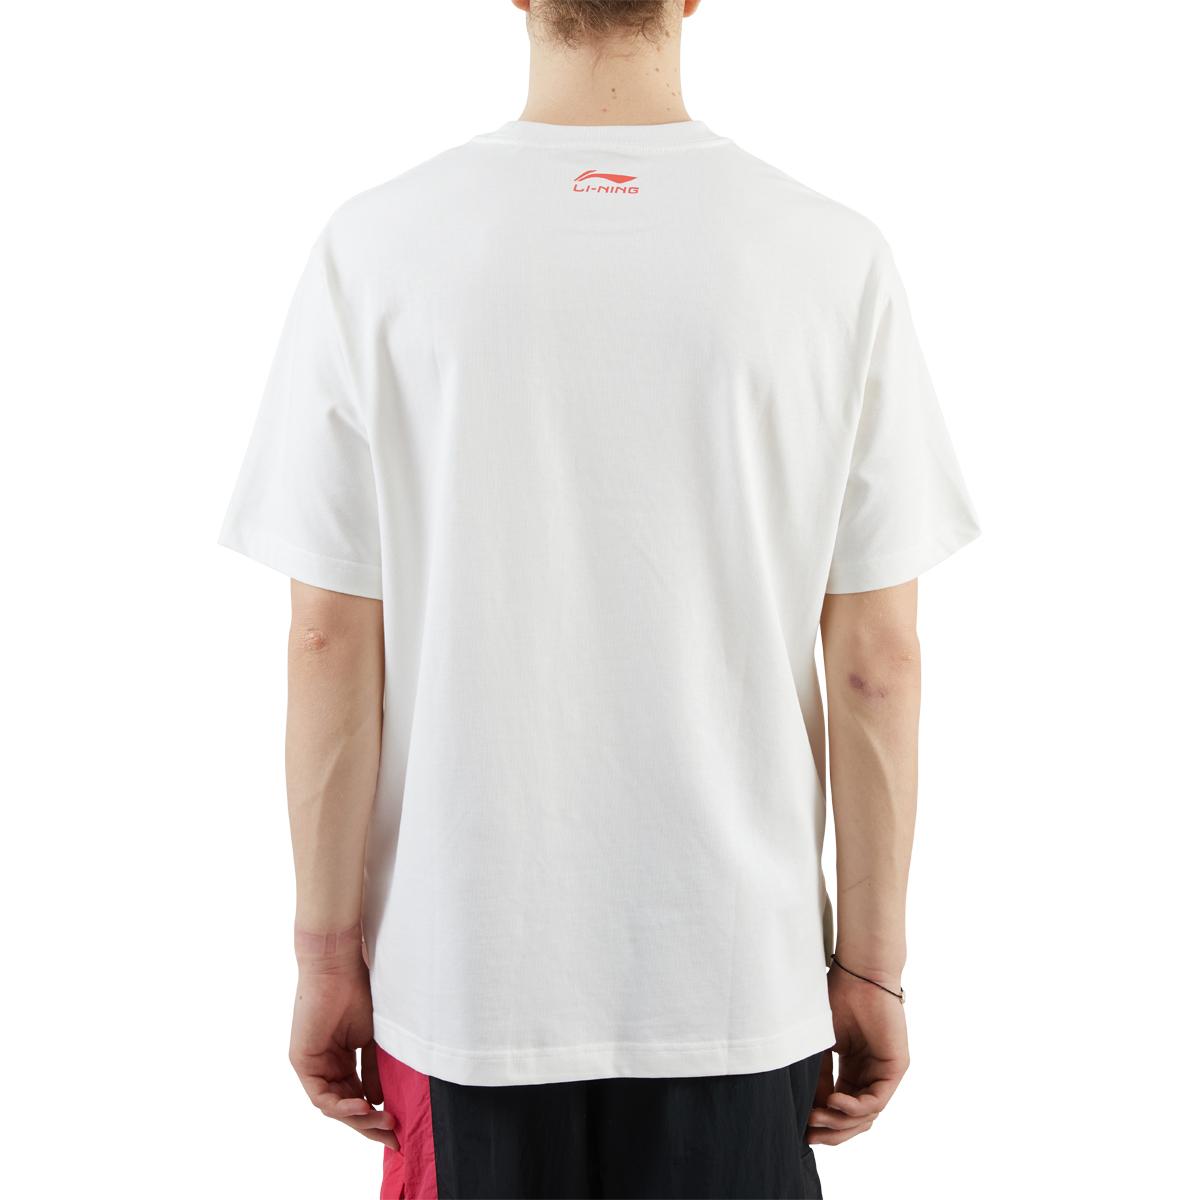 Li-Ning Short Sleeve Tee White Back